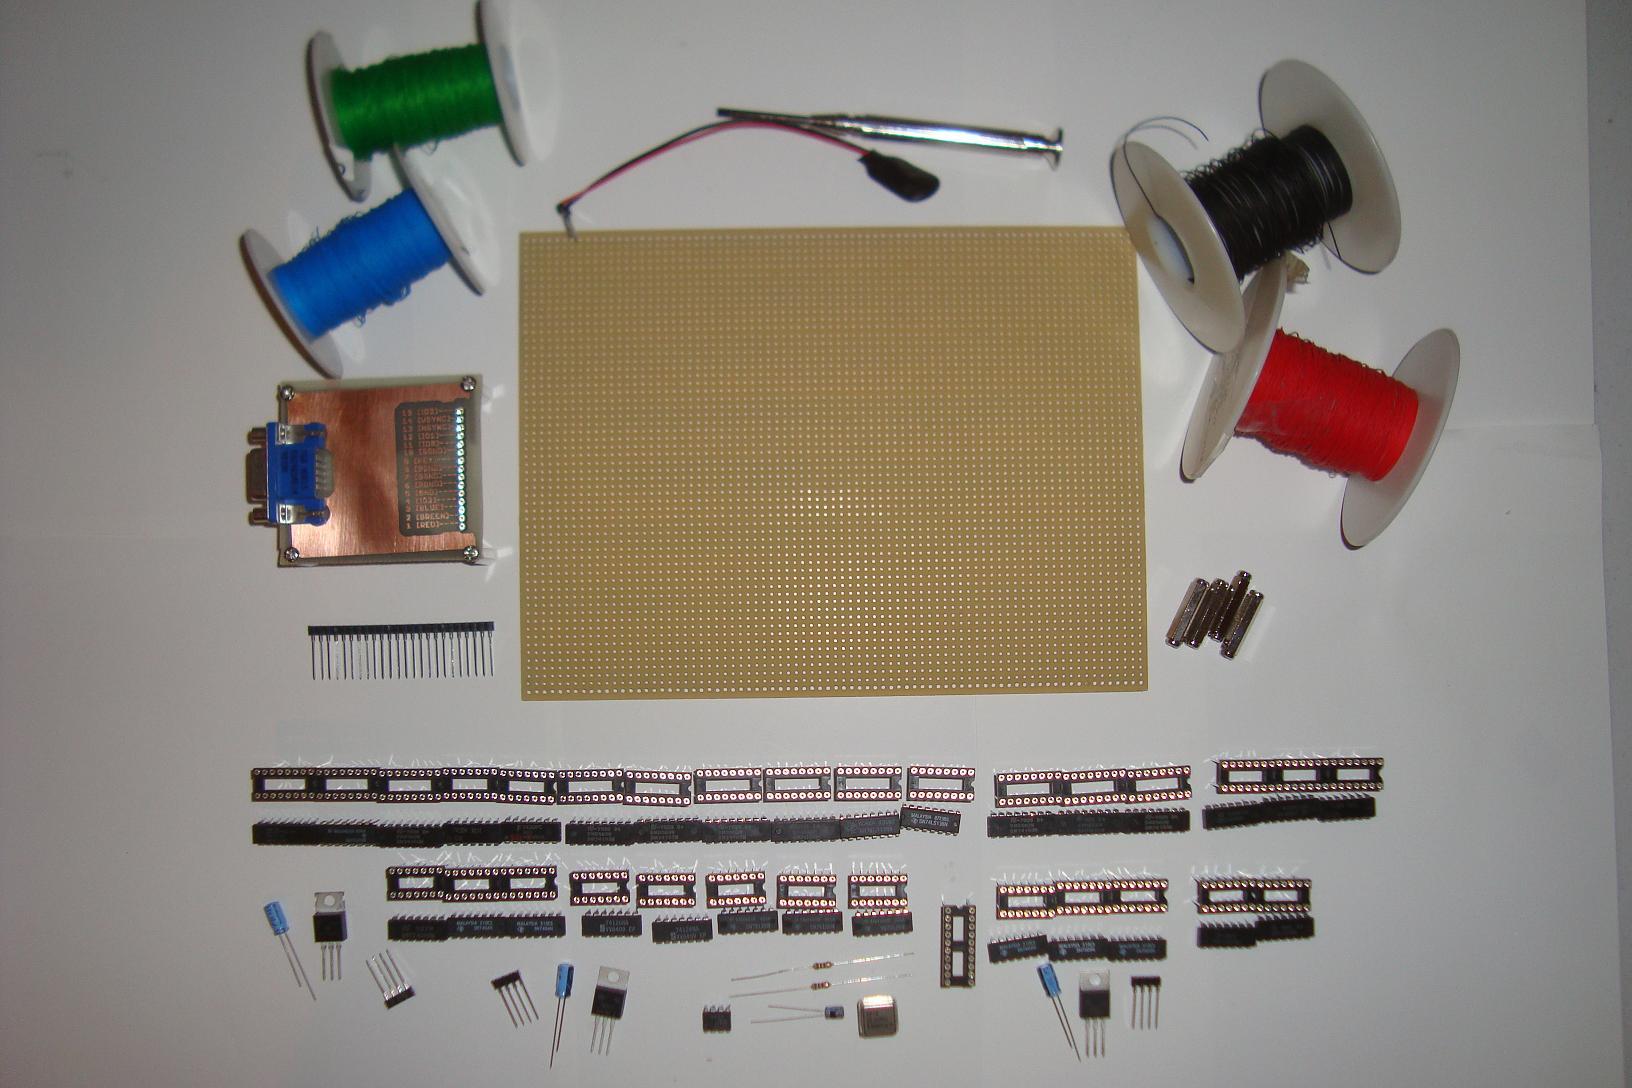 Masochist U0026 39 S Video Card - Hardware